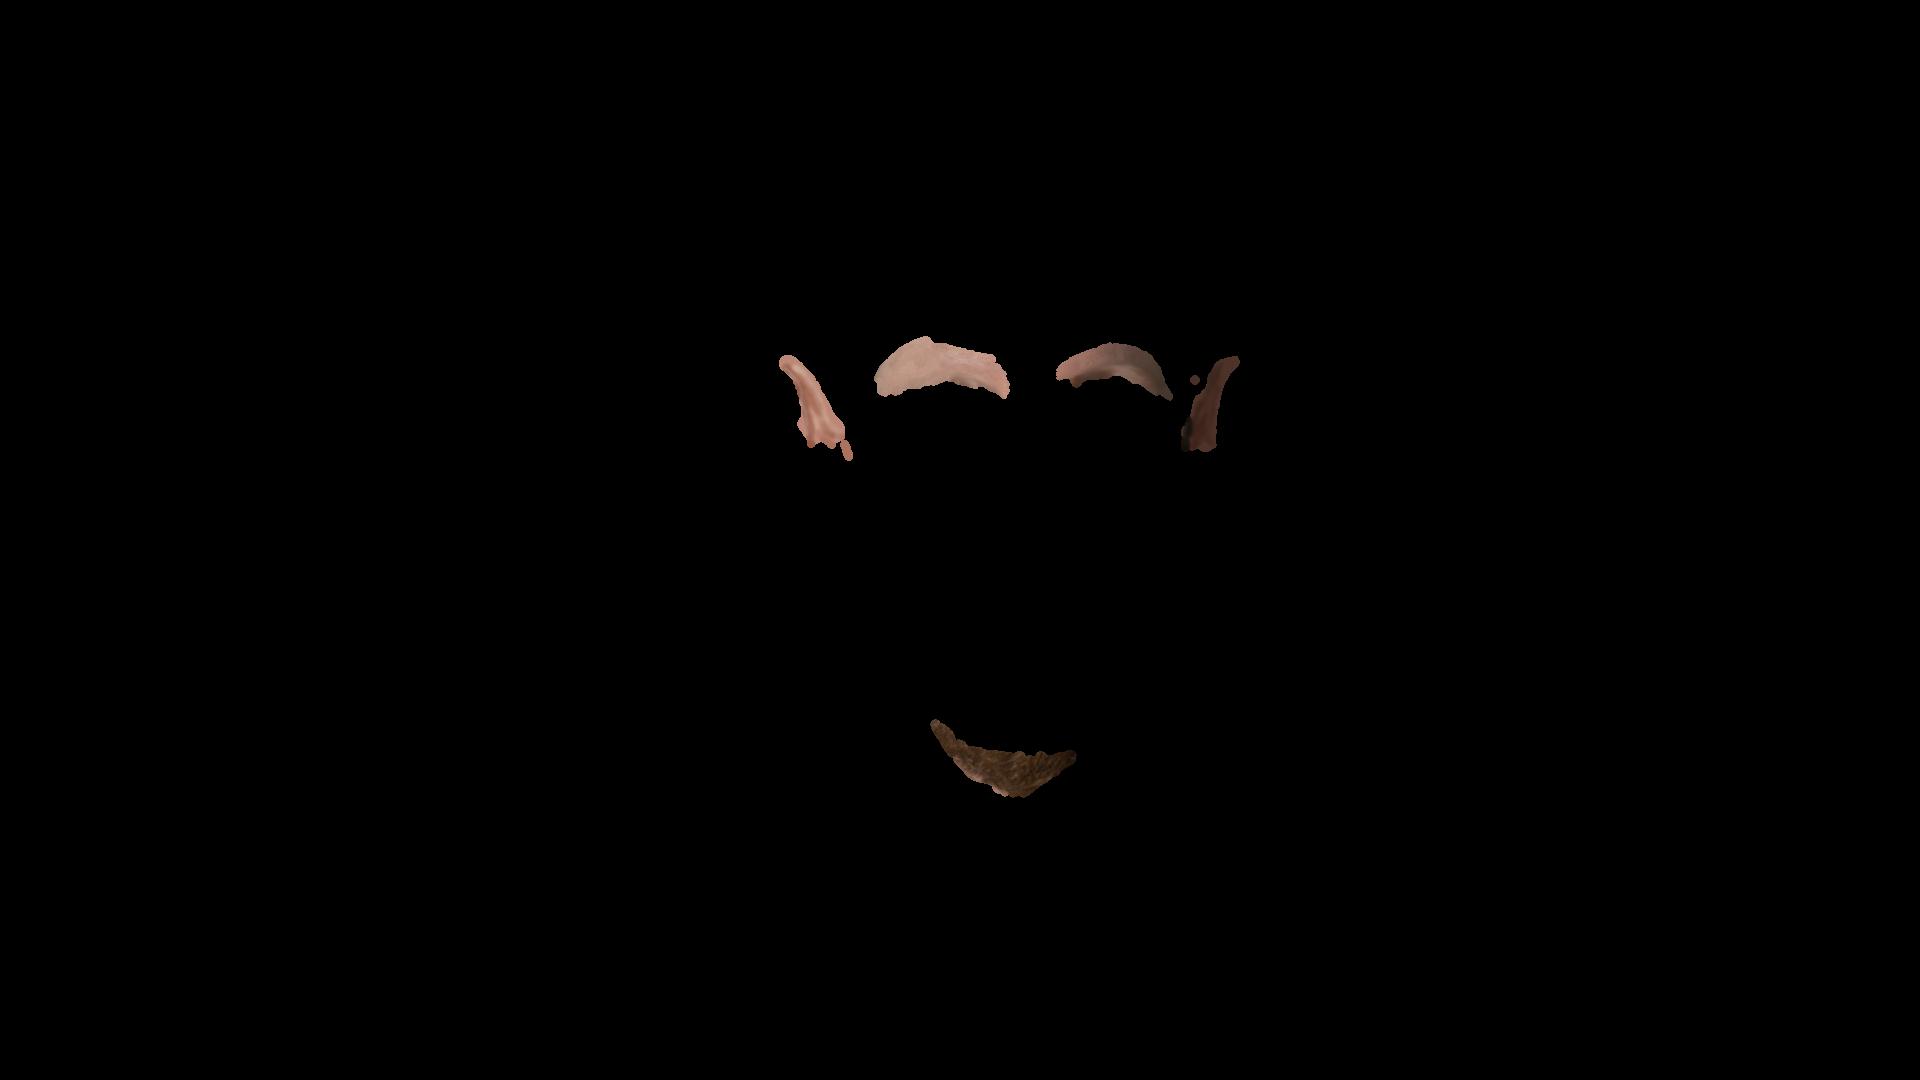 078-demon